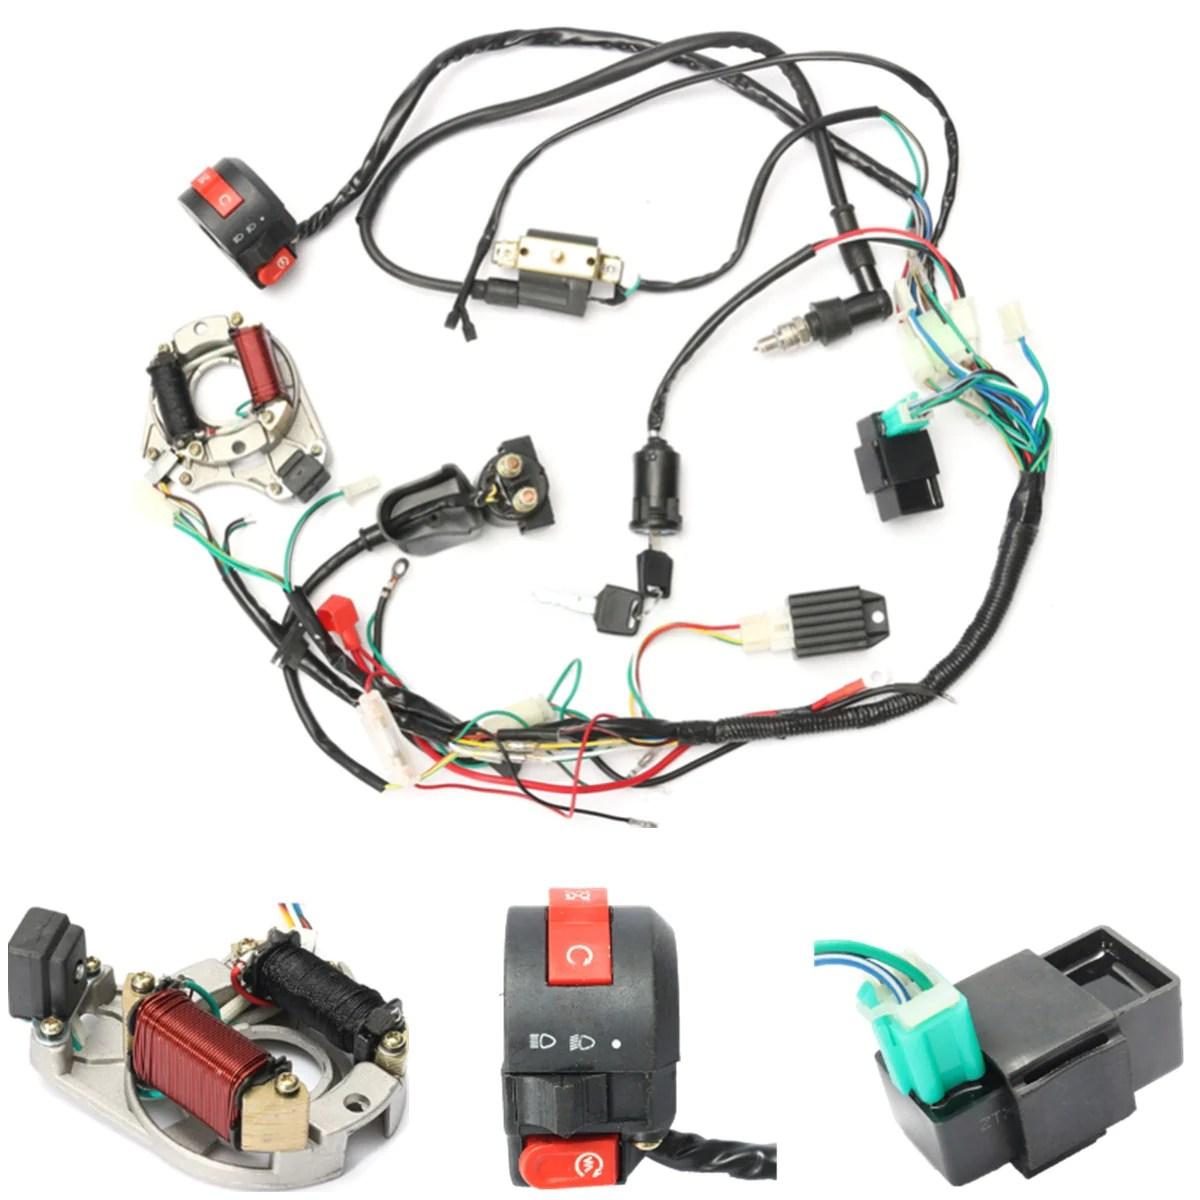 kymco cdi box ac plug wiring harness wiring diagram progresif cdi 25km kymco peugeot sym 50cc [ 1200 x 1200 Pixel ]